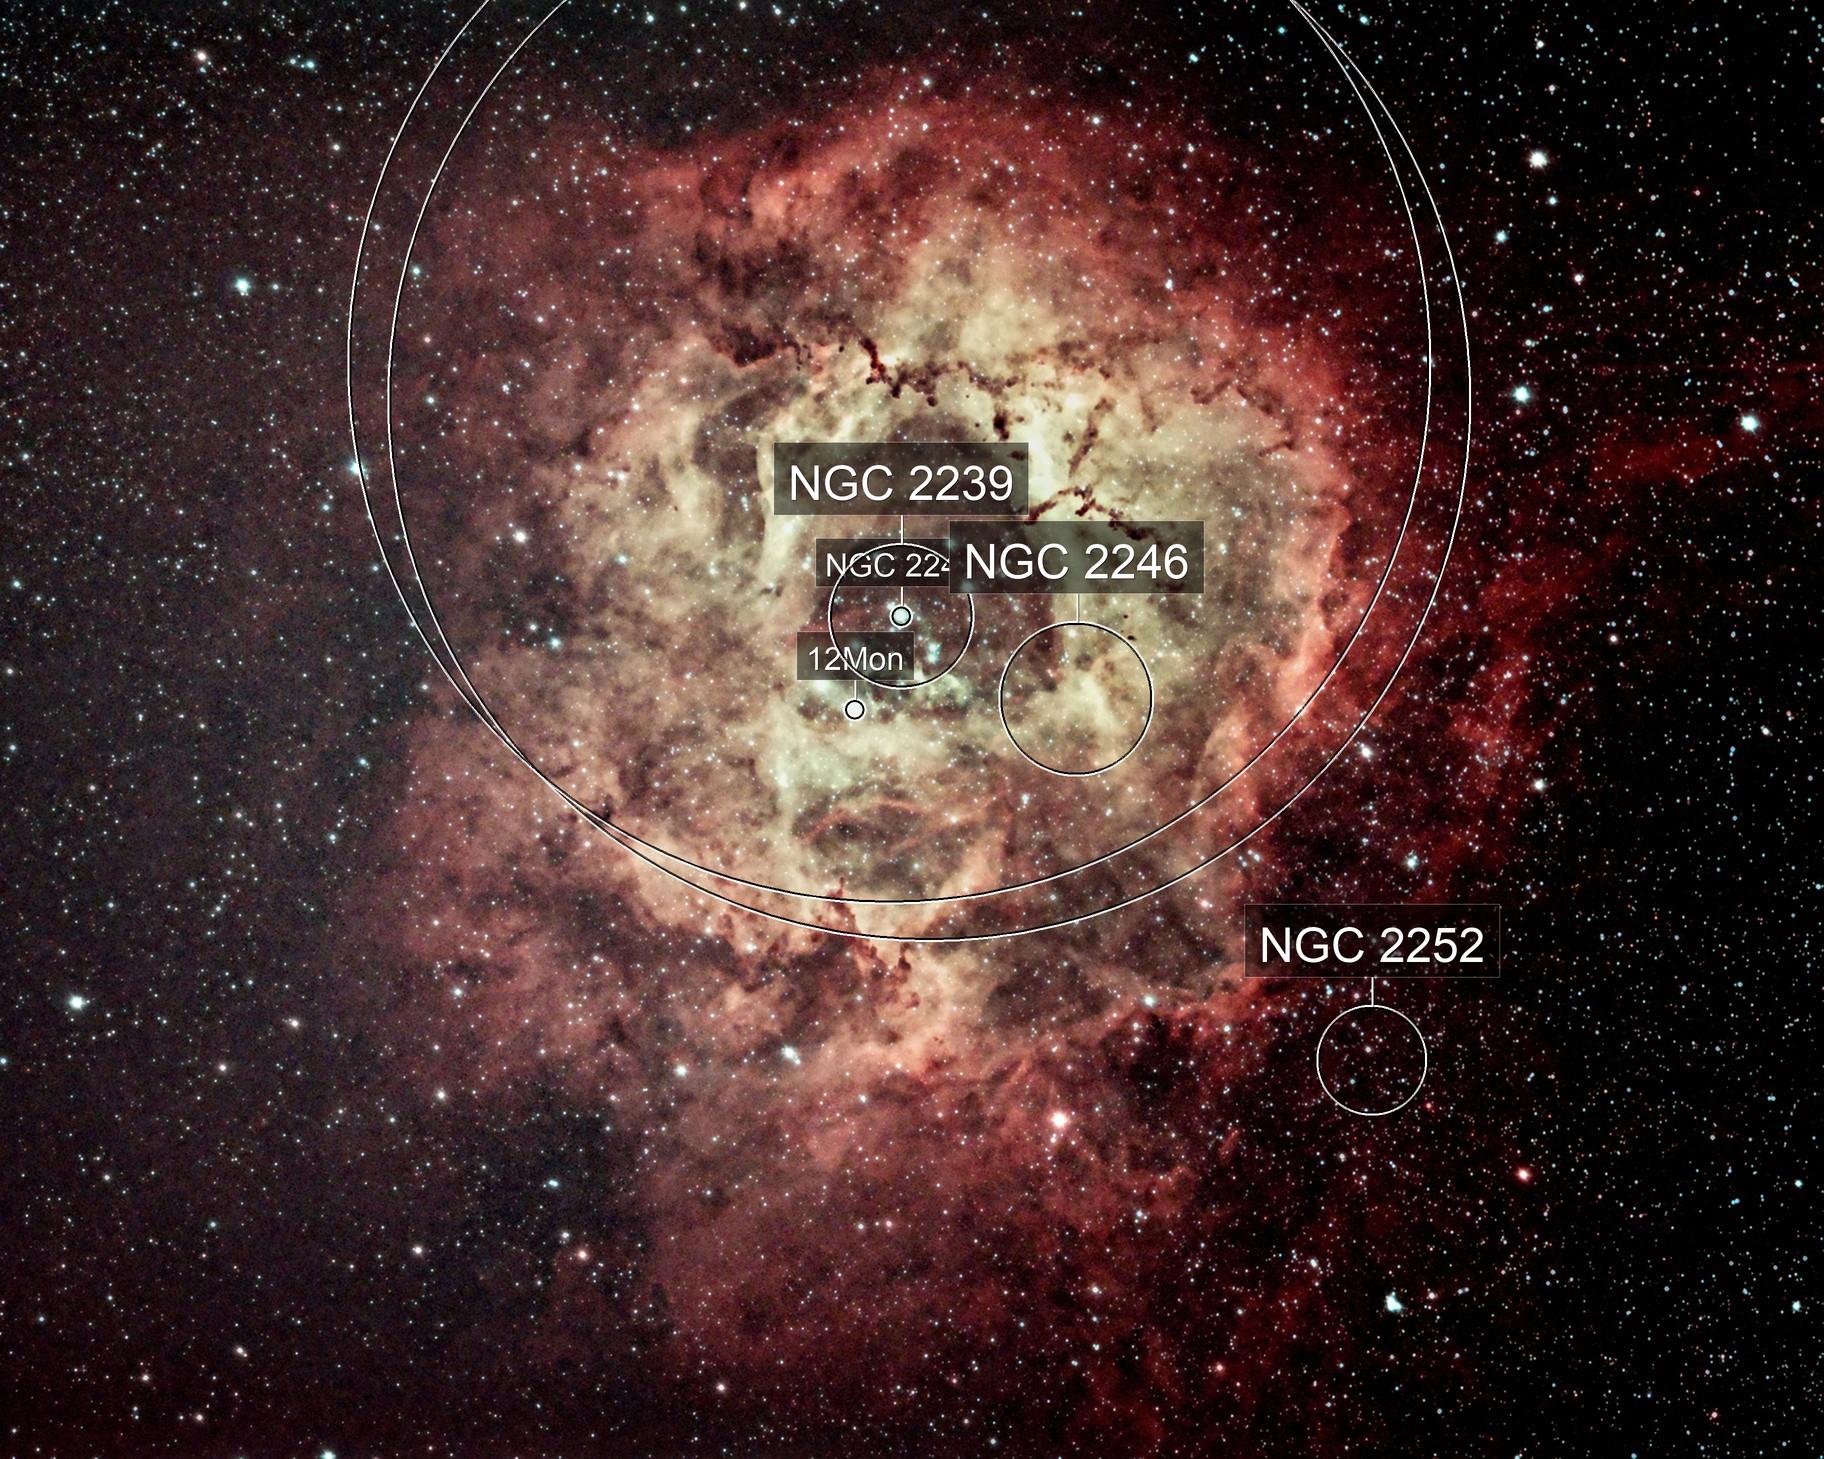 Rosette Nebula - NGC 2244